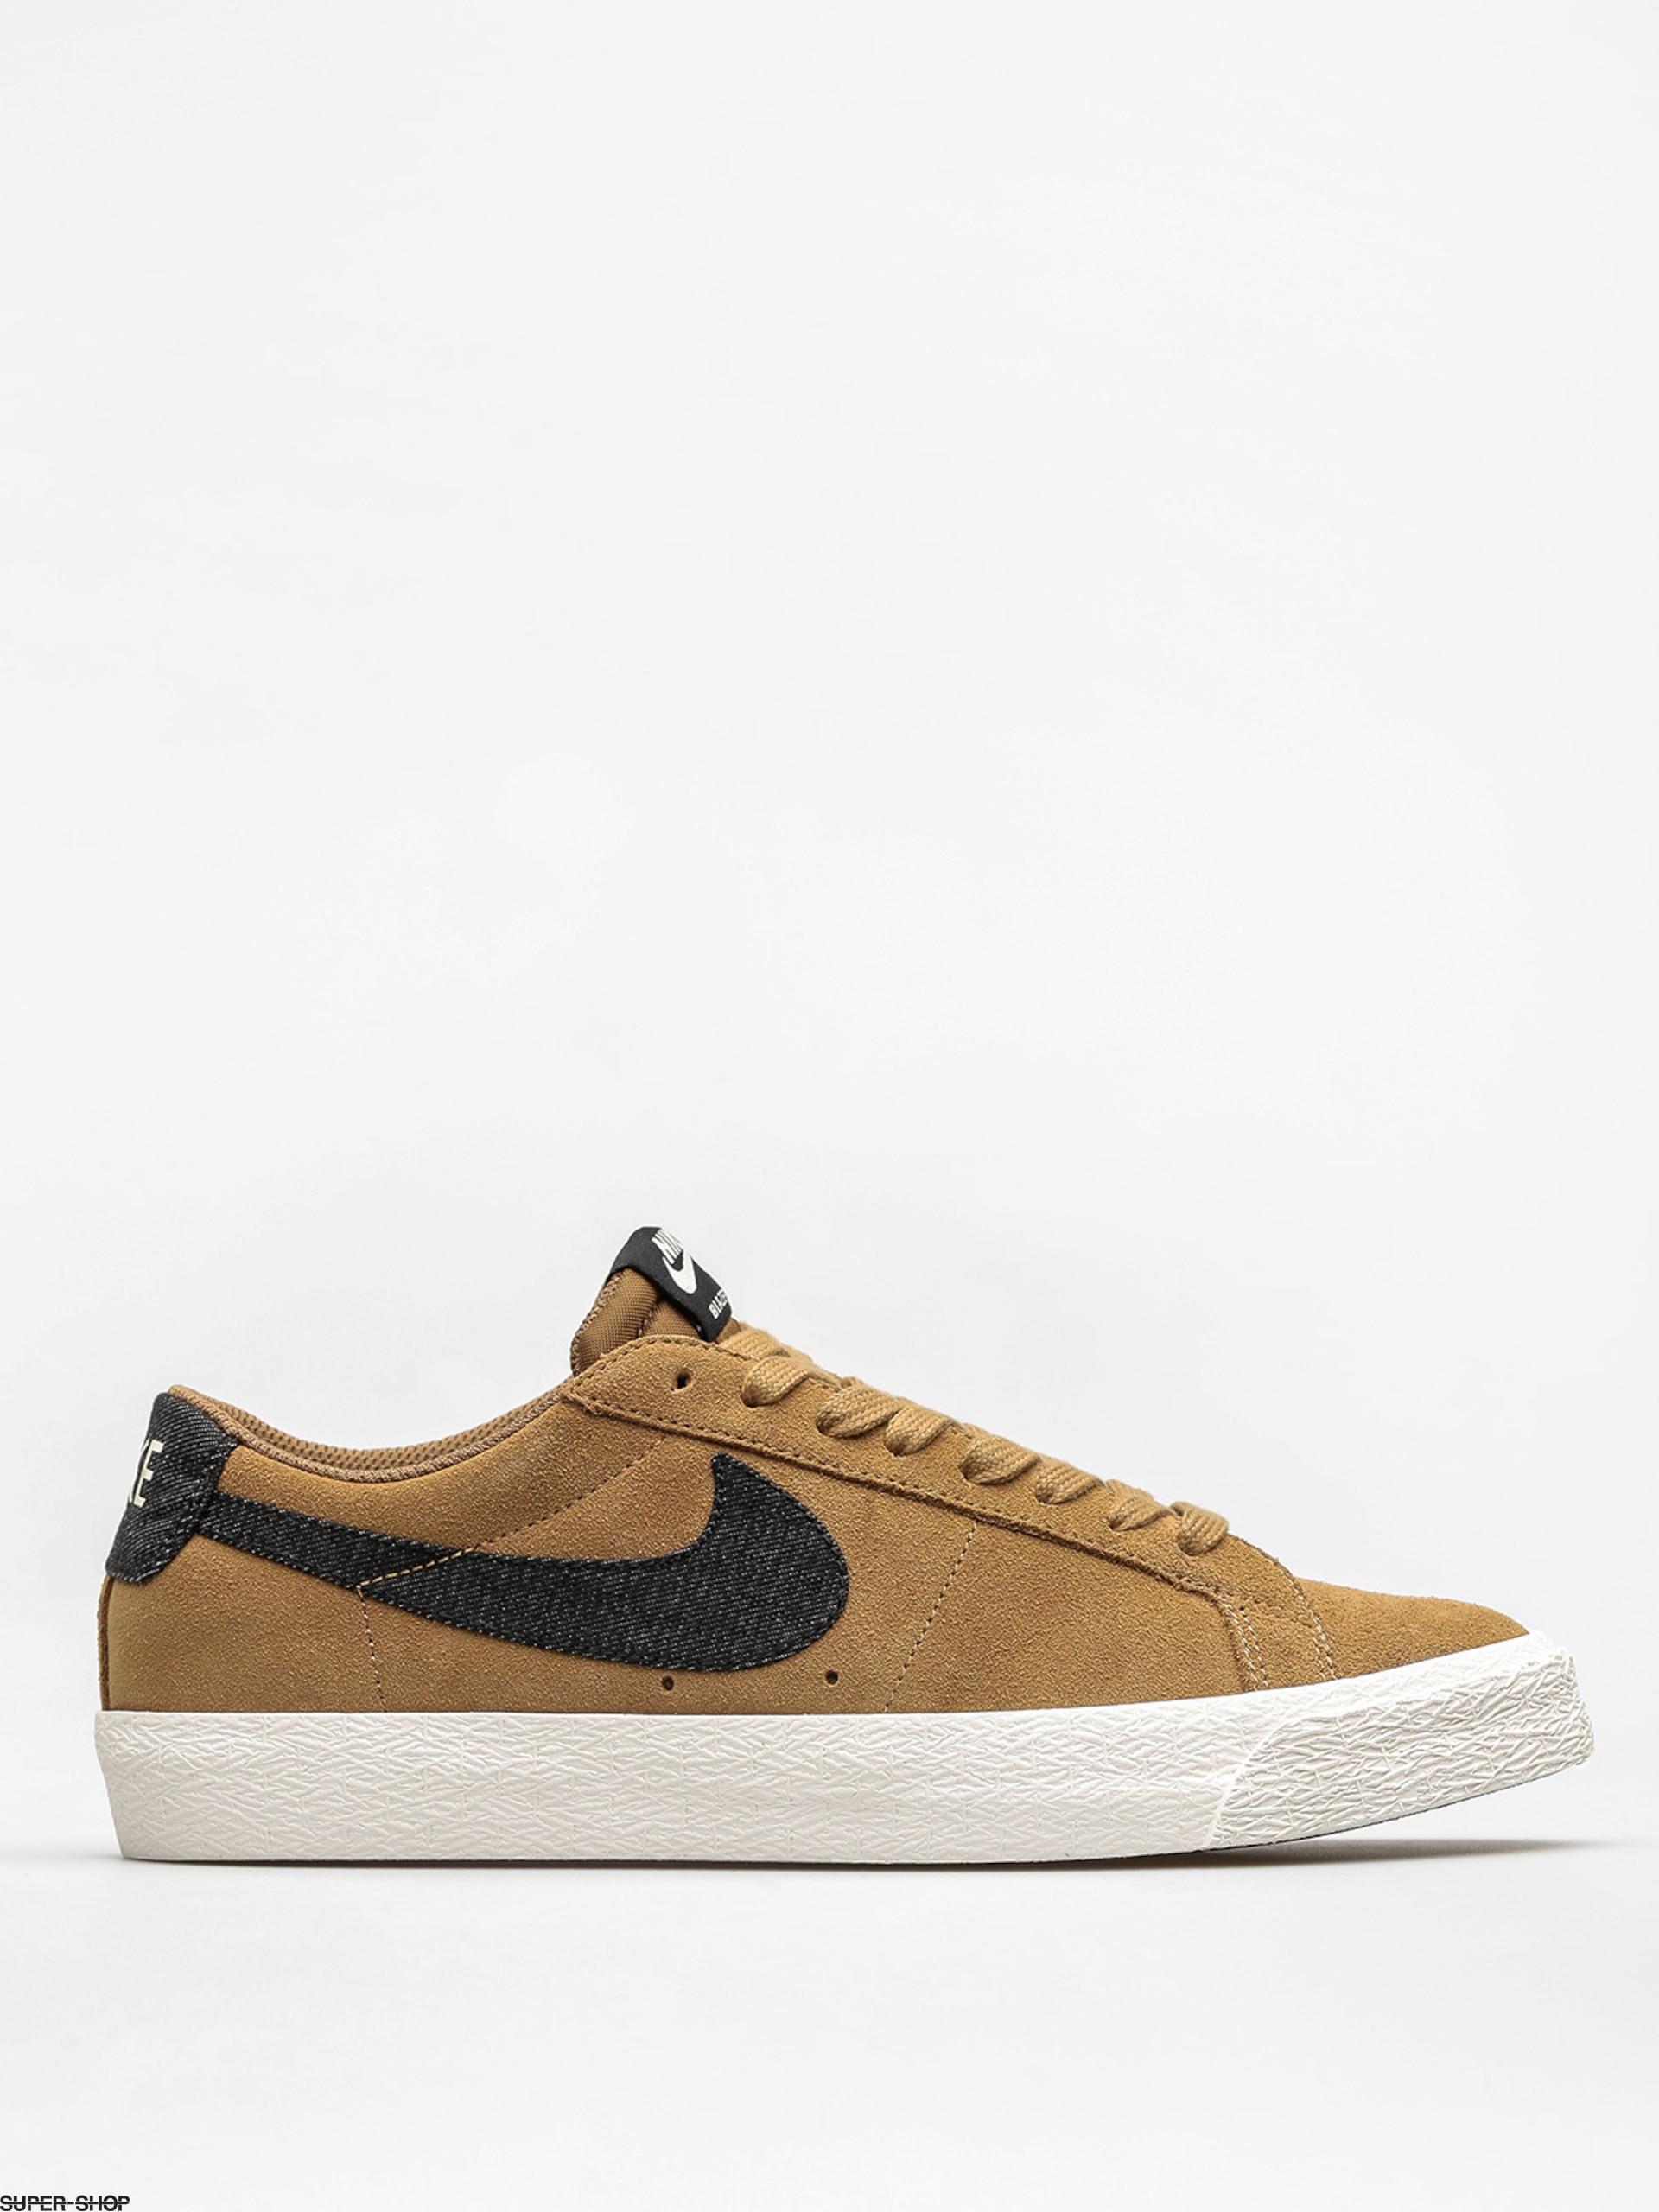 hot sale online 489dc e0970 where to buy nike sb shoes zoom blazer low golden beige black sail gum  light brown